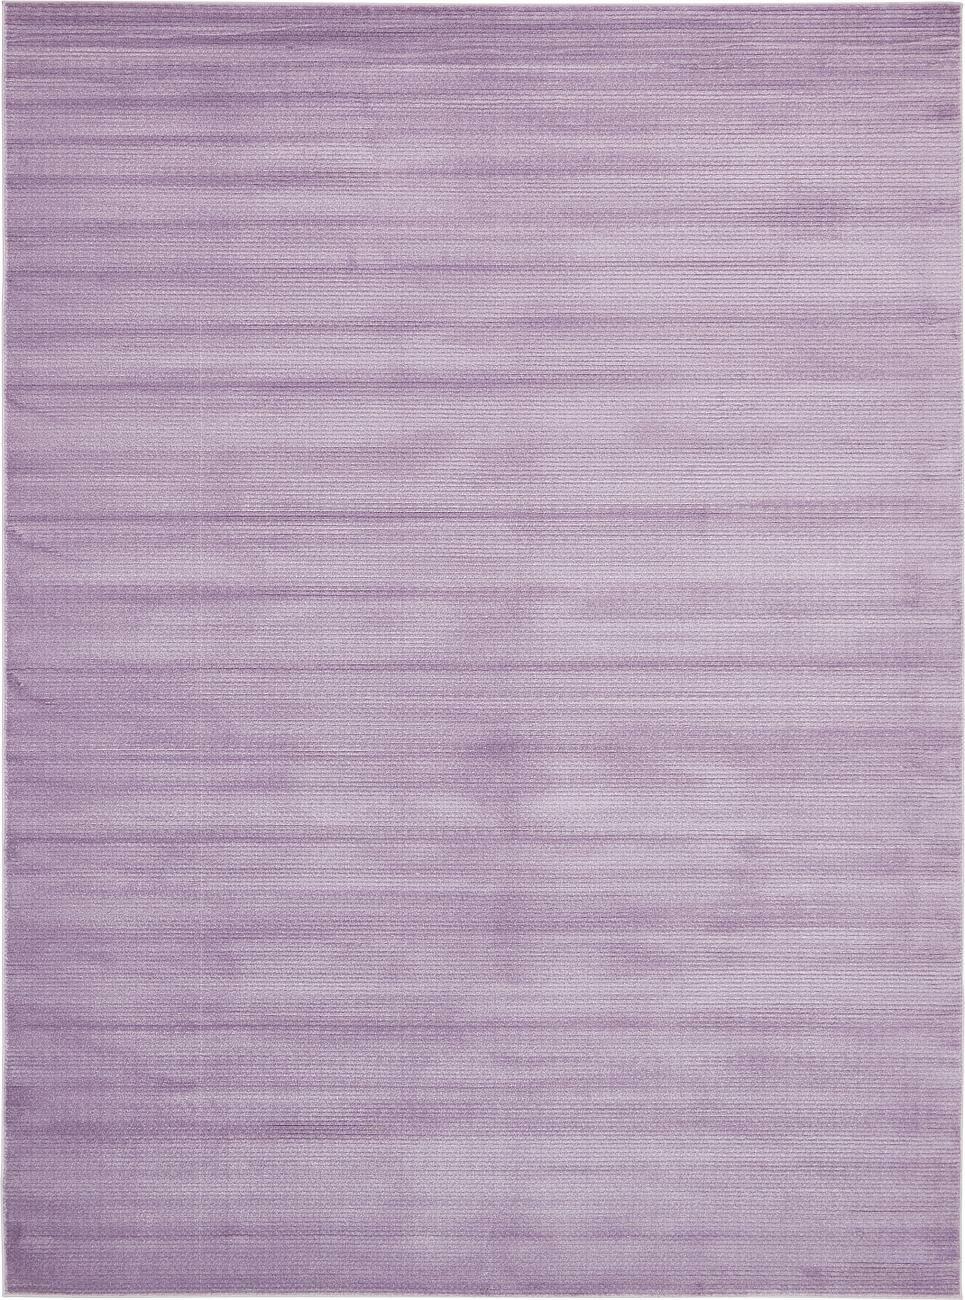 Levi Lavender Area Rug Rug Size: Rectangle 5' x 8'